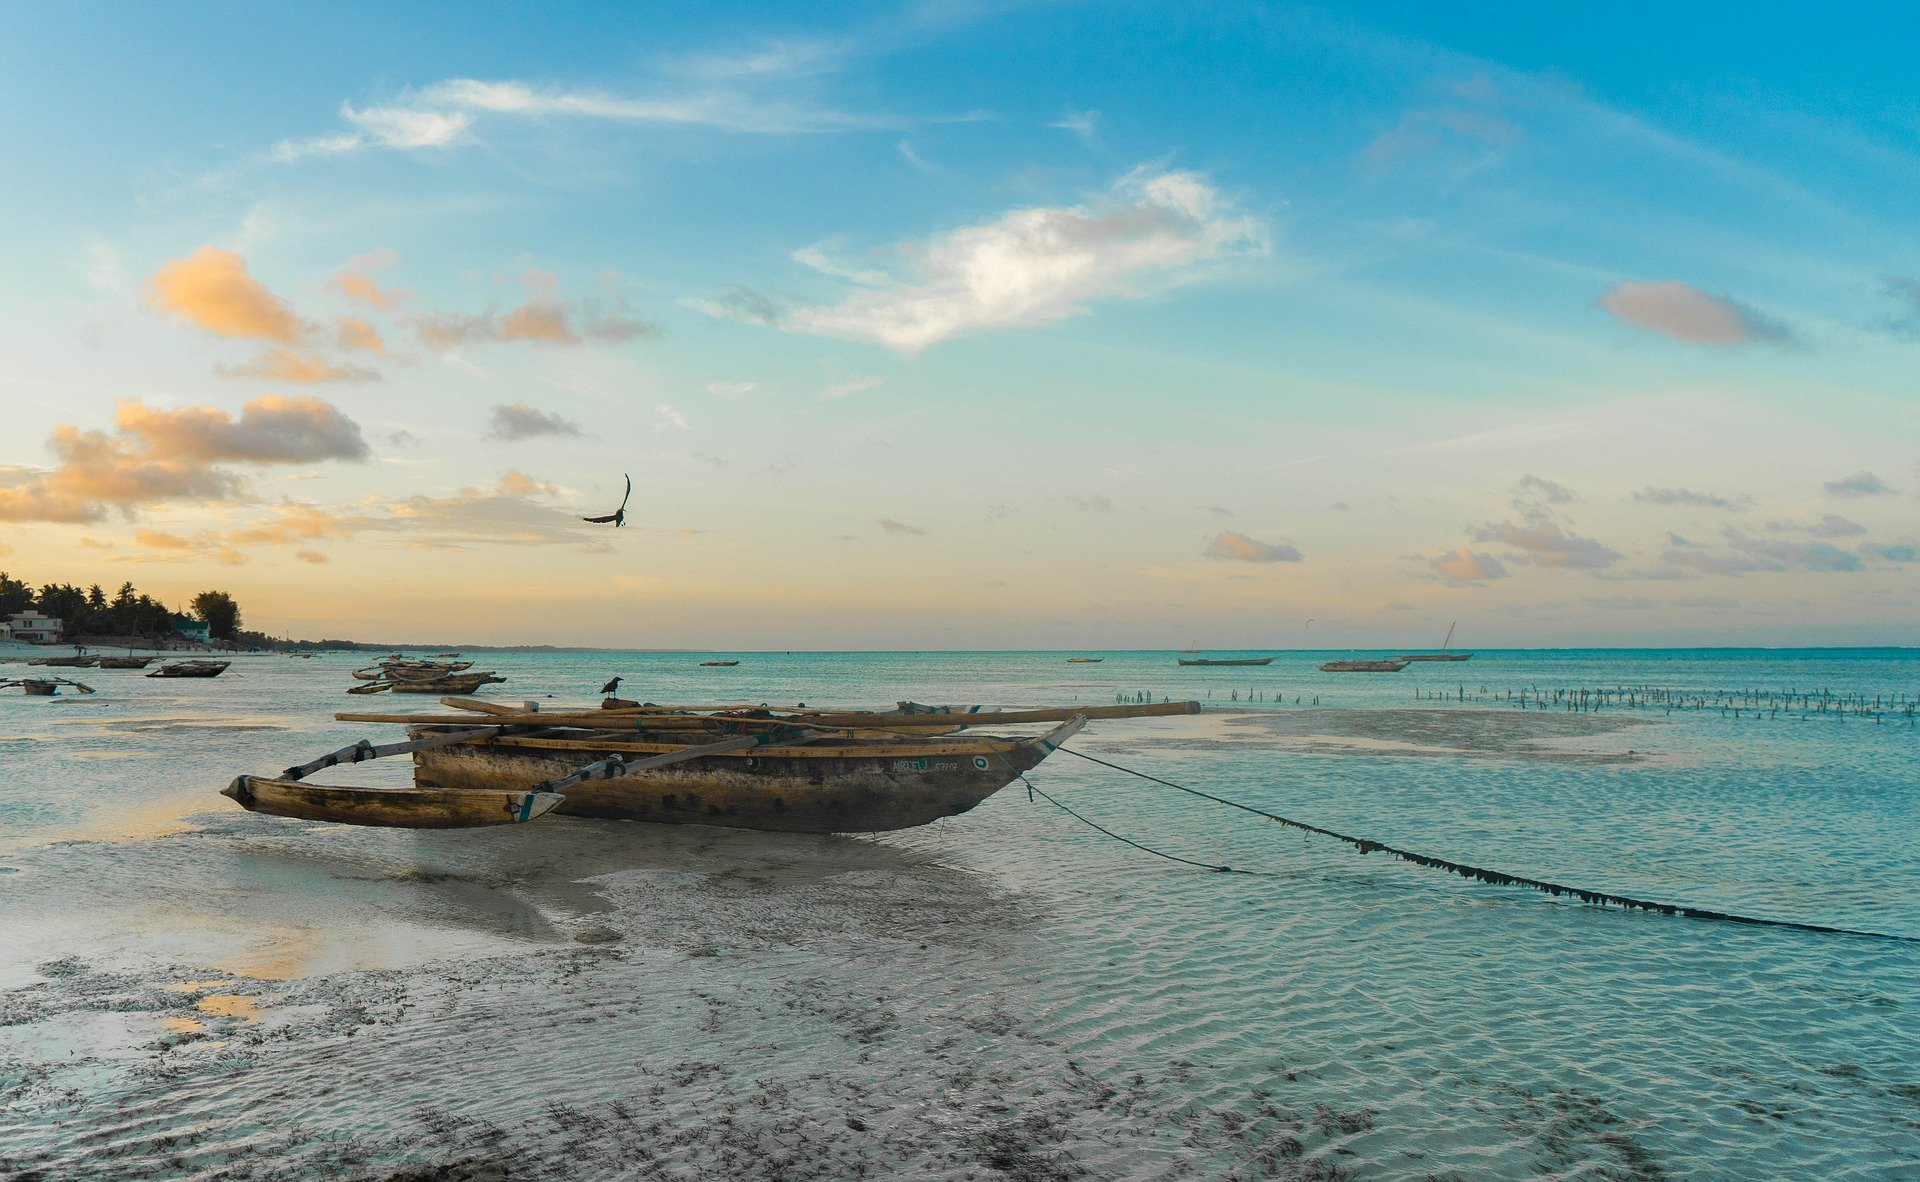 Destination image of Zanzibar